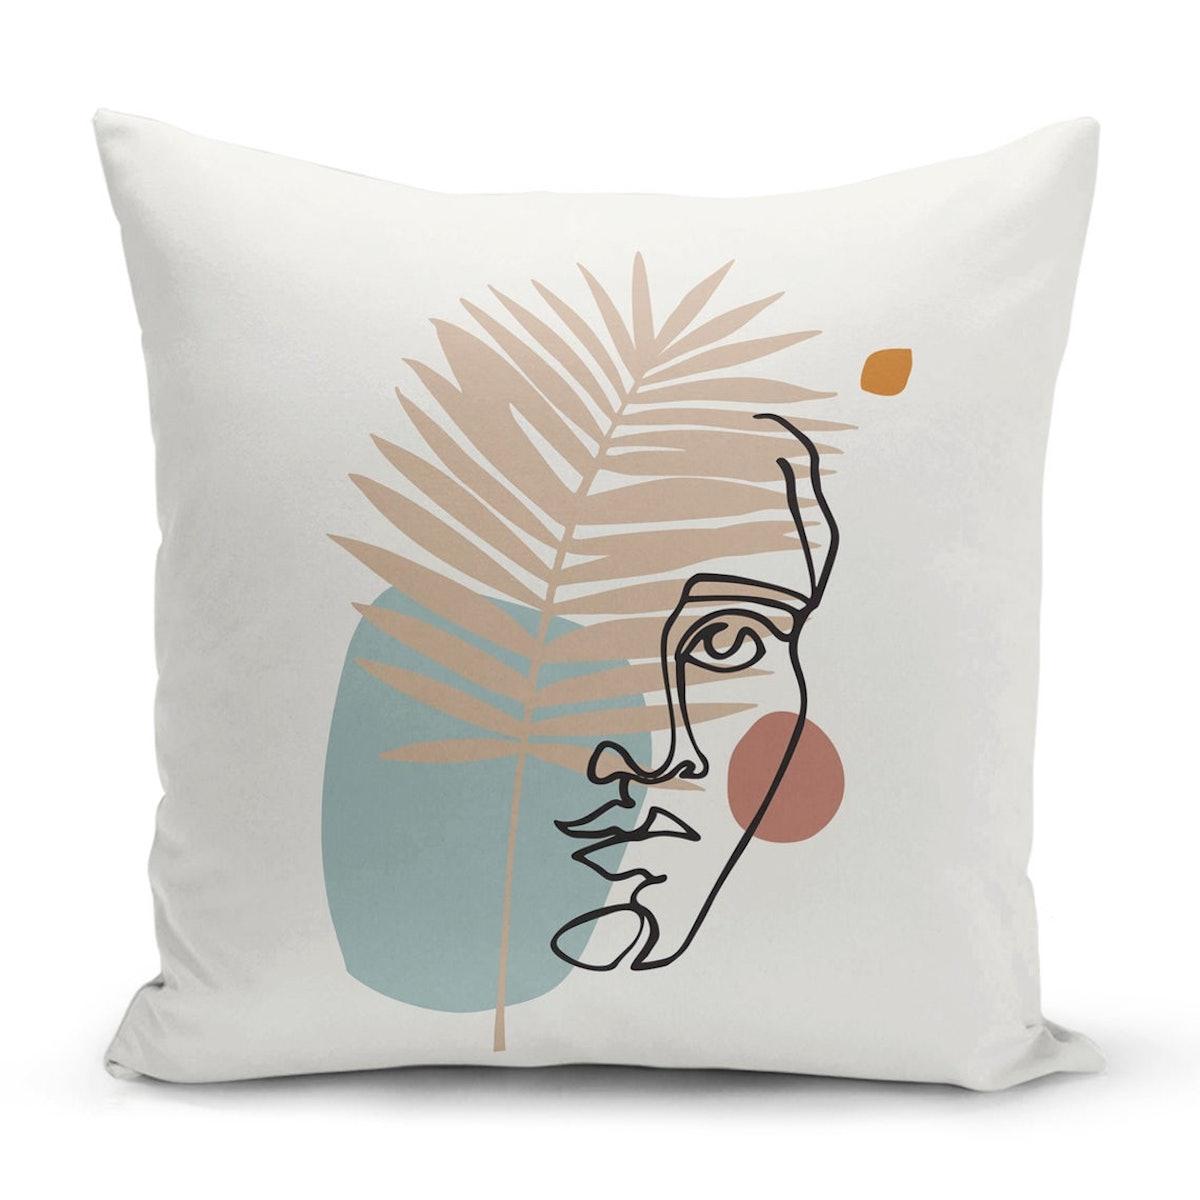 Minimalist Woman Face Throw Pillow